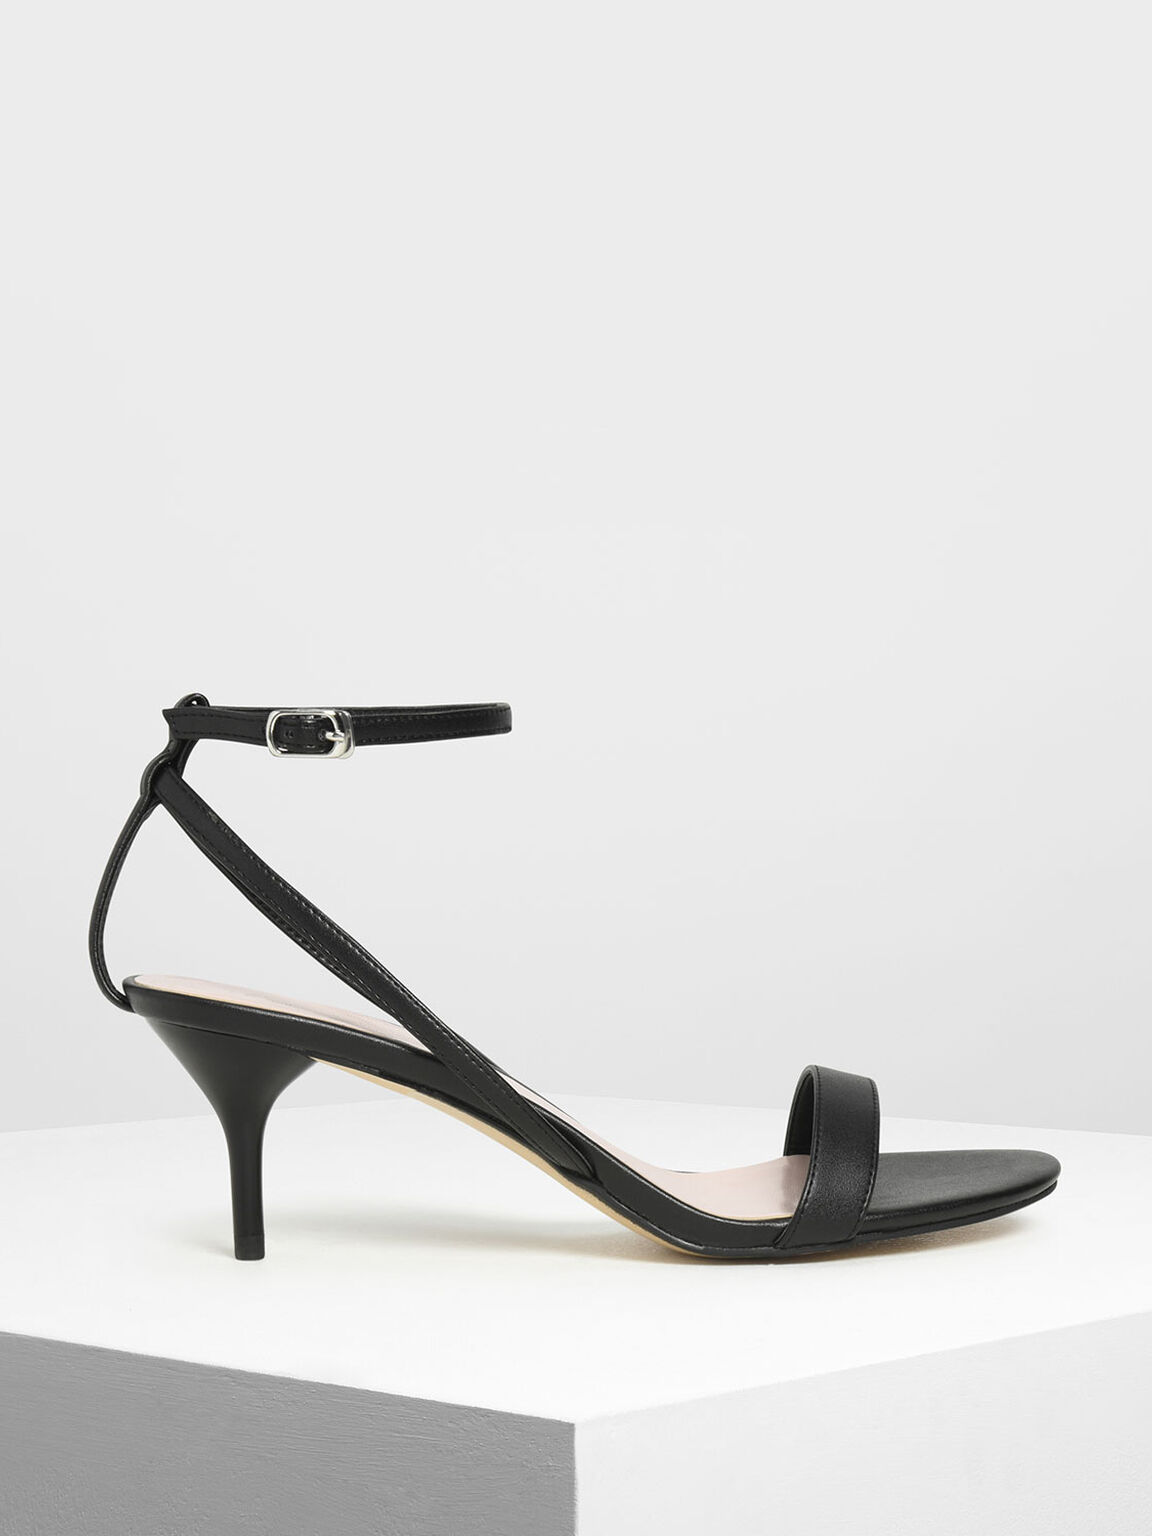 Classic Ankle Strap Sandals, Black, hi-res